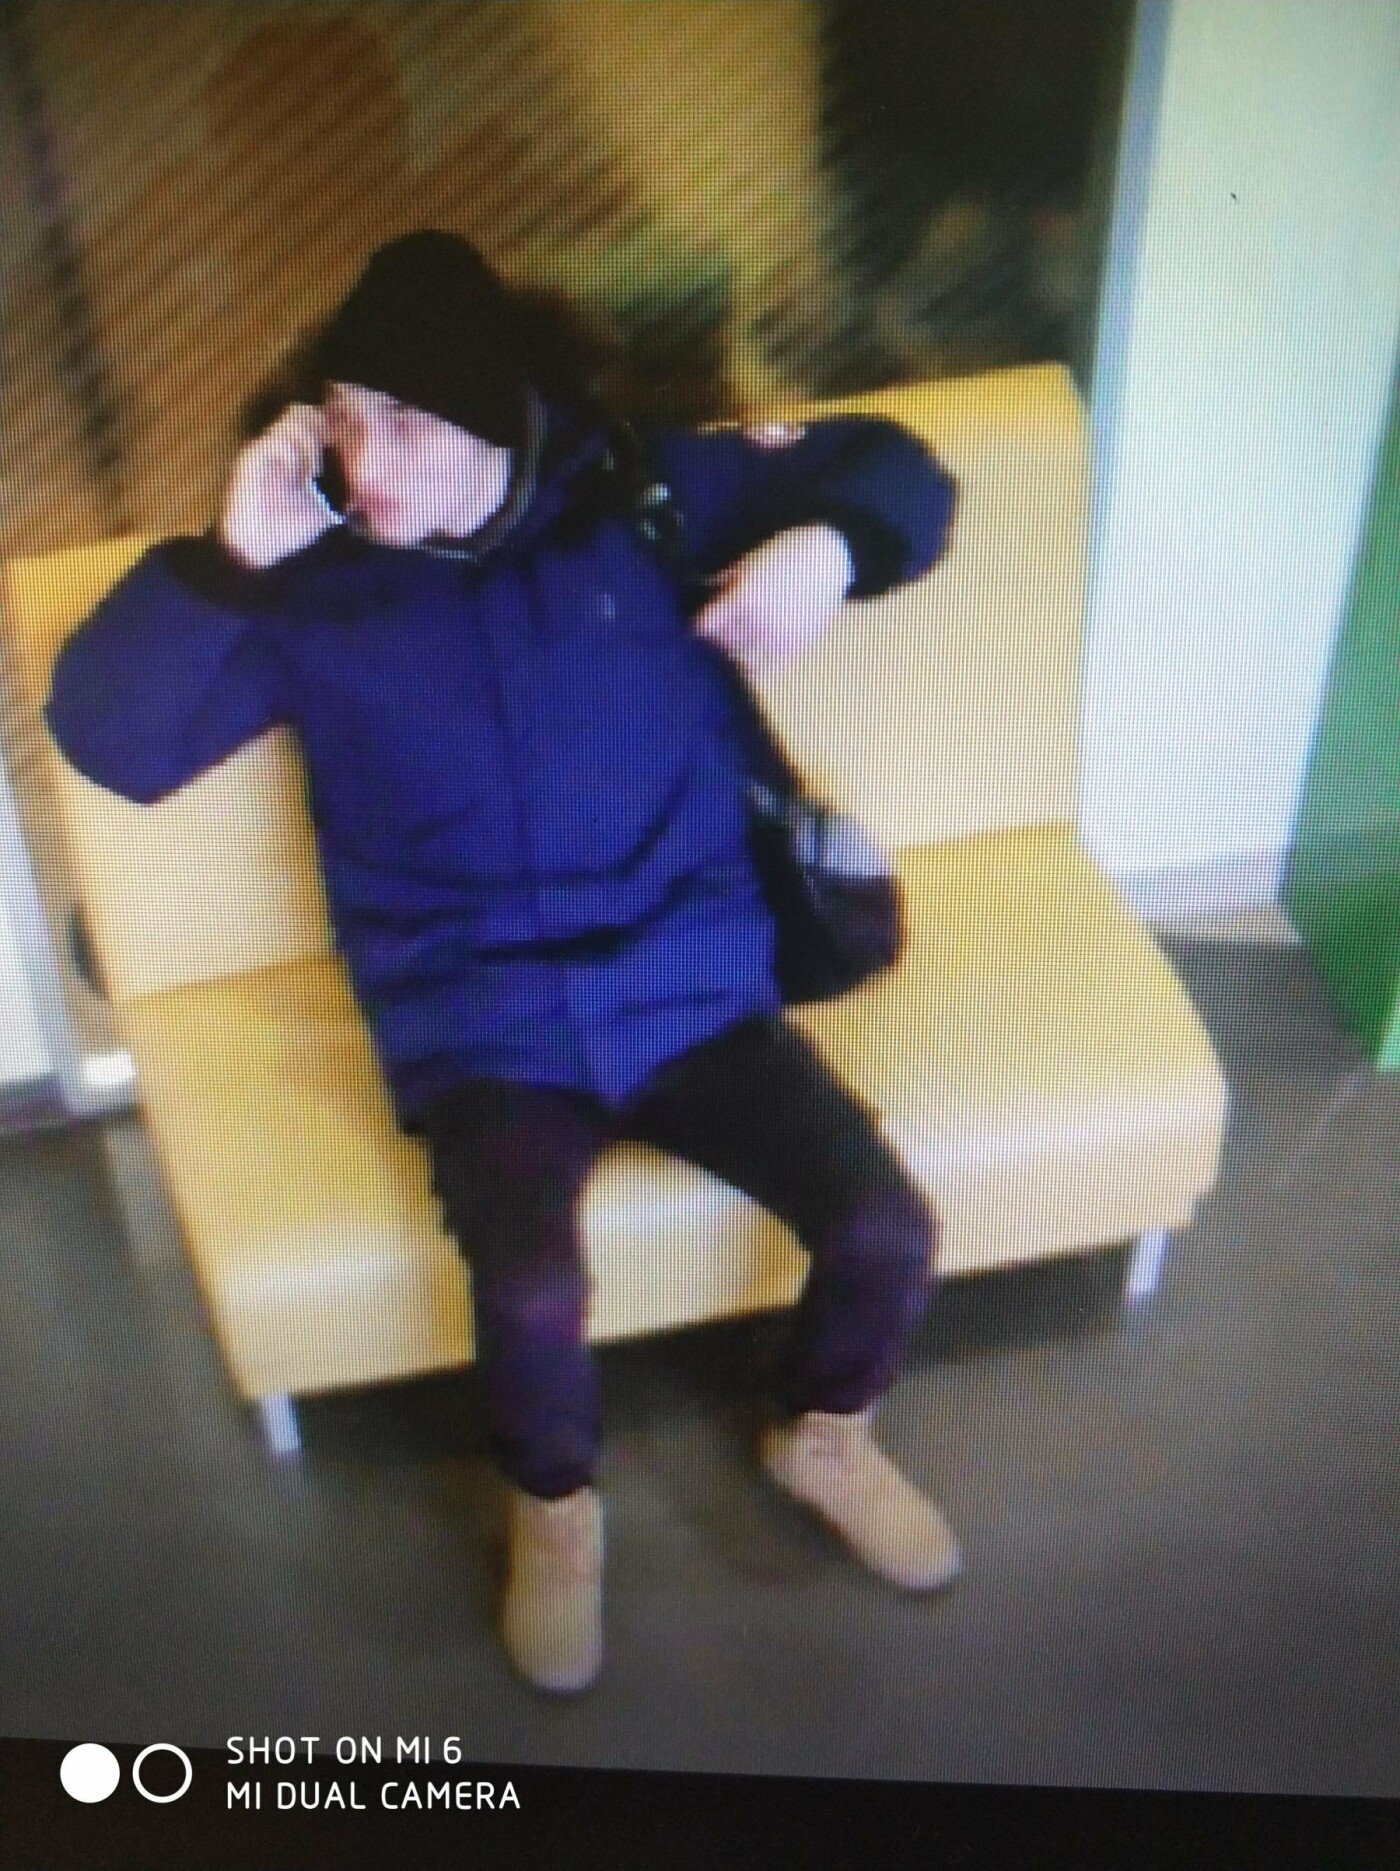 Подозреваемого в мошенничестве ищут в Петропавловске, фото-2